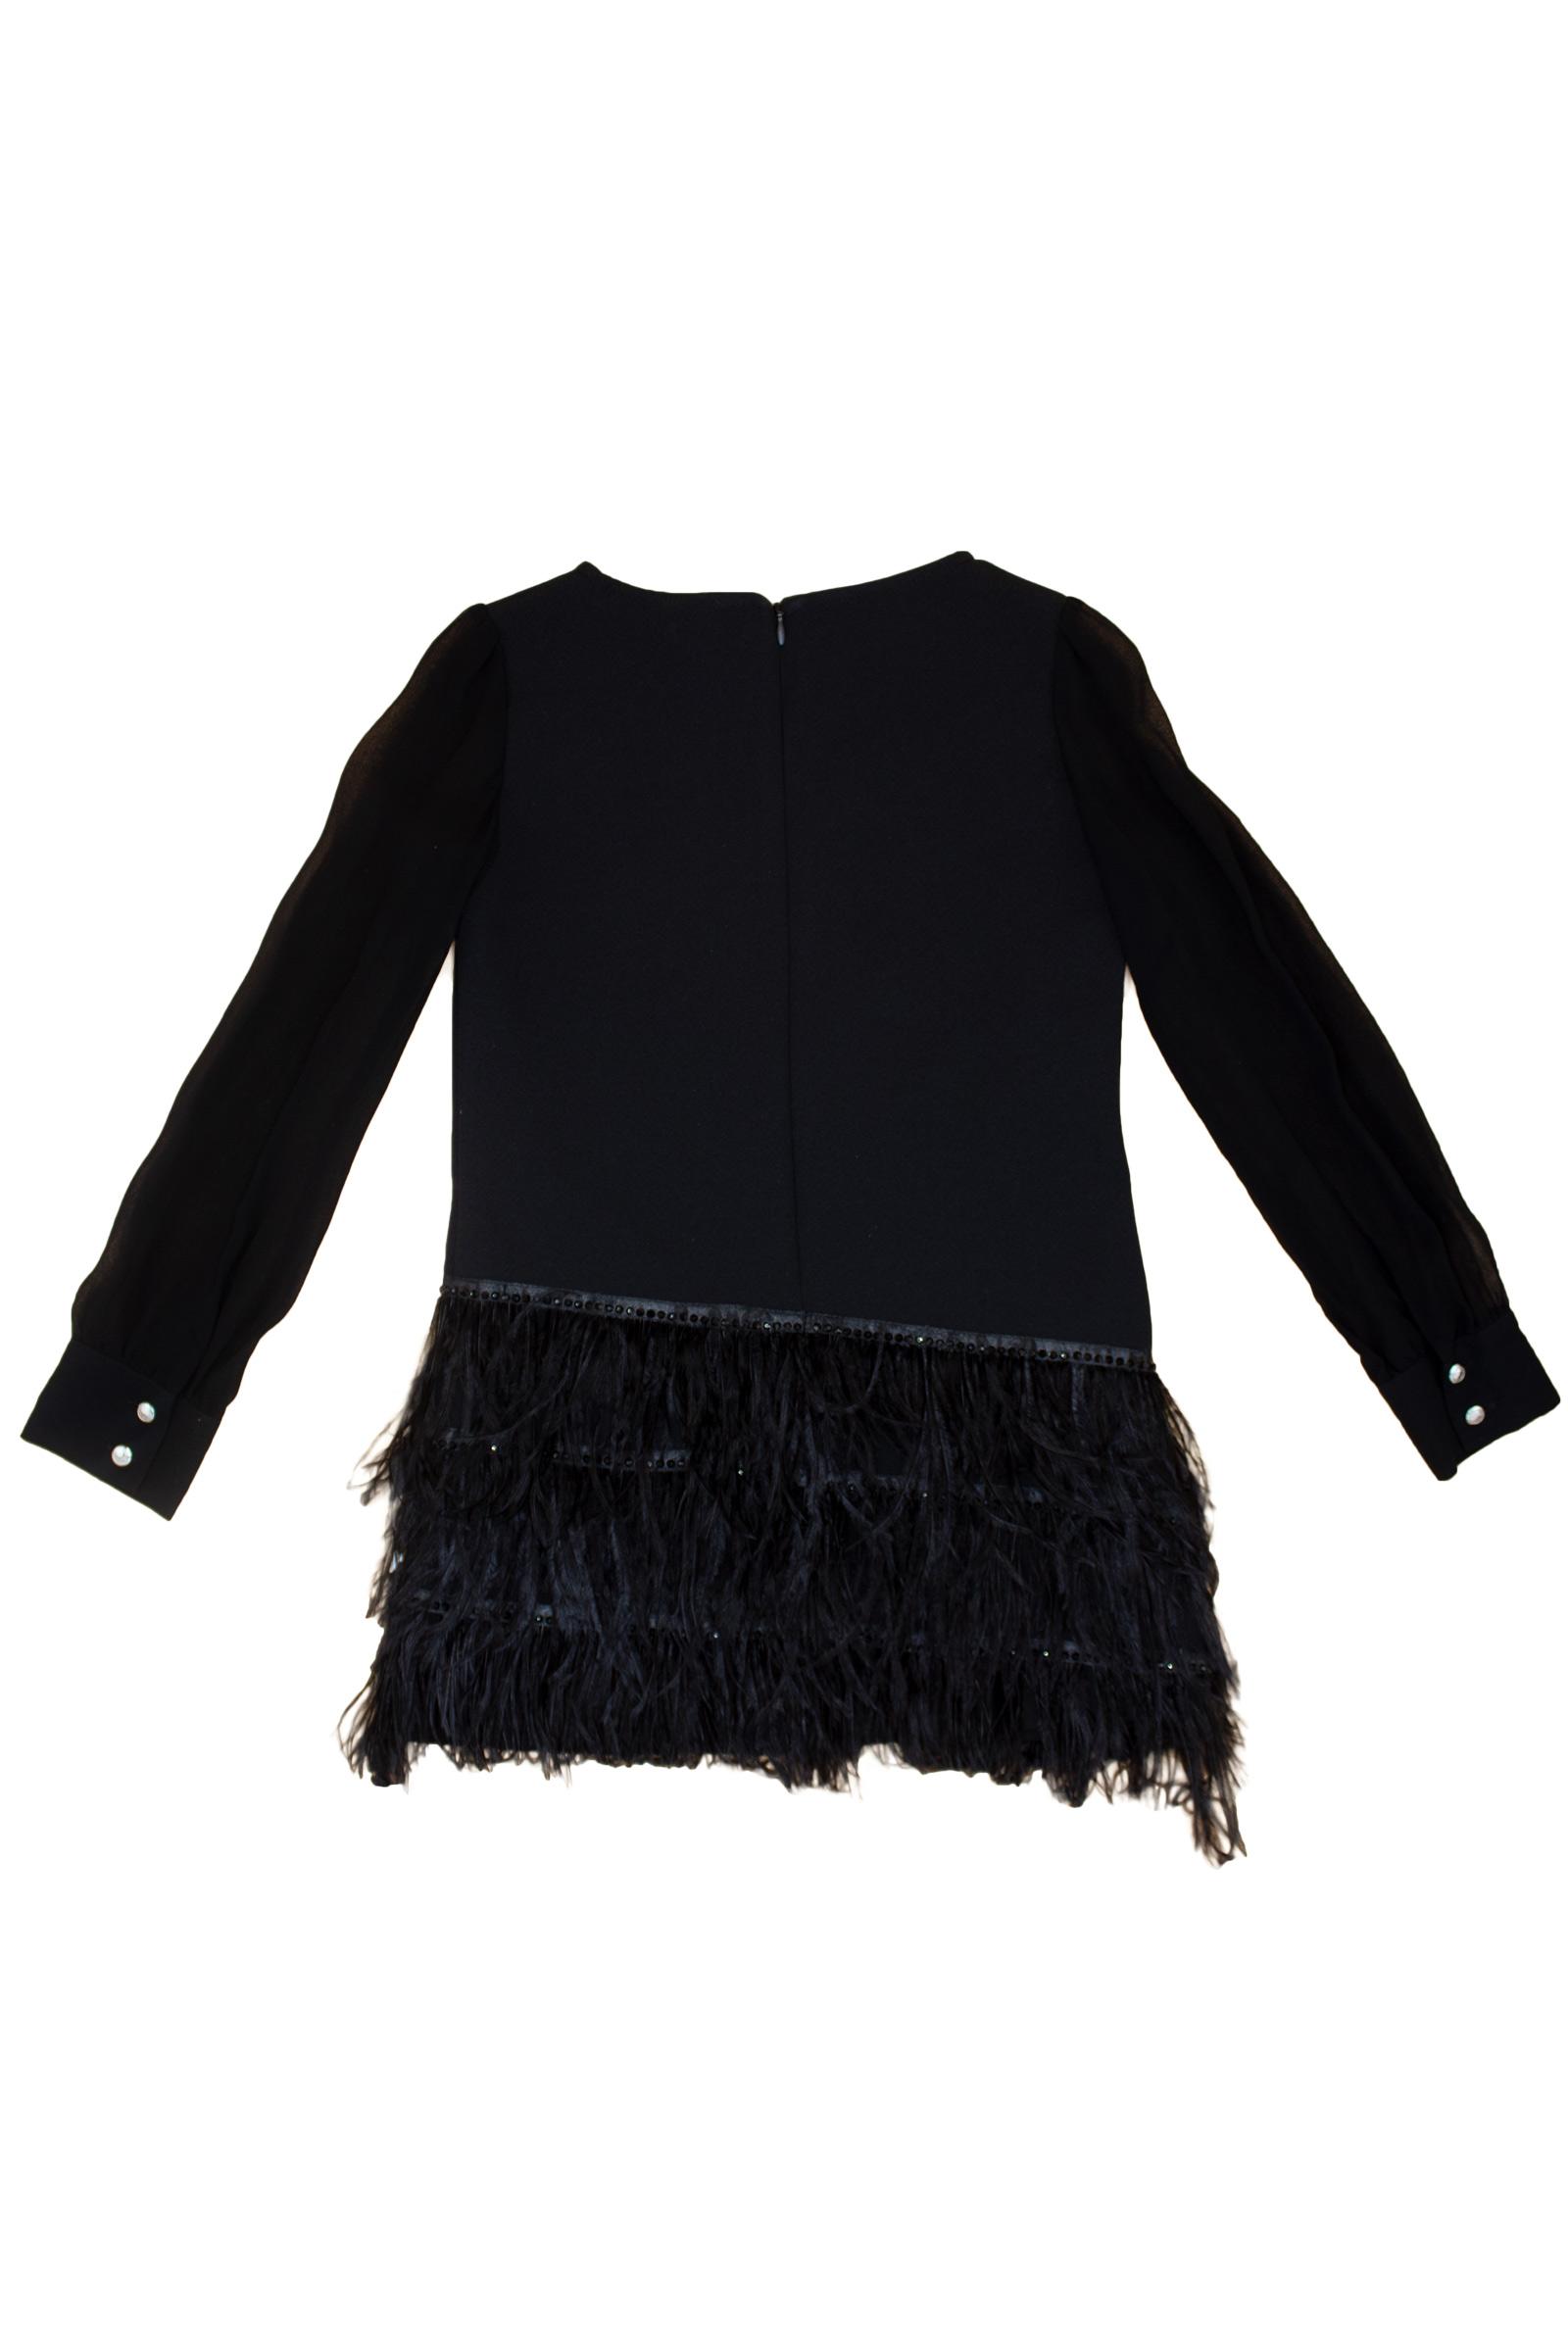 patrizia pepe dress PATRIZIA PEPE | Ceremony dress | PJFAB0842330995